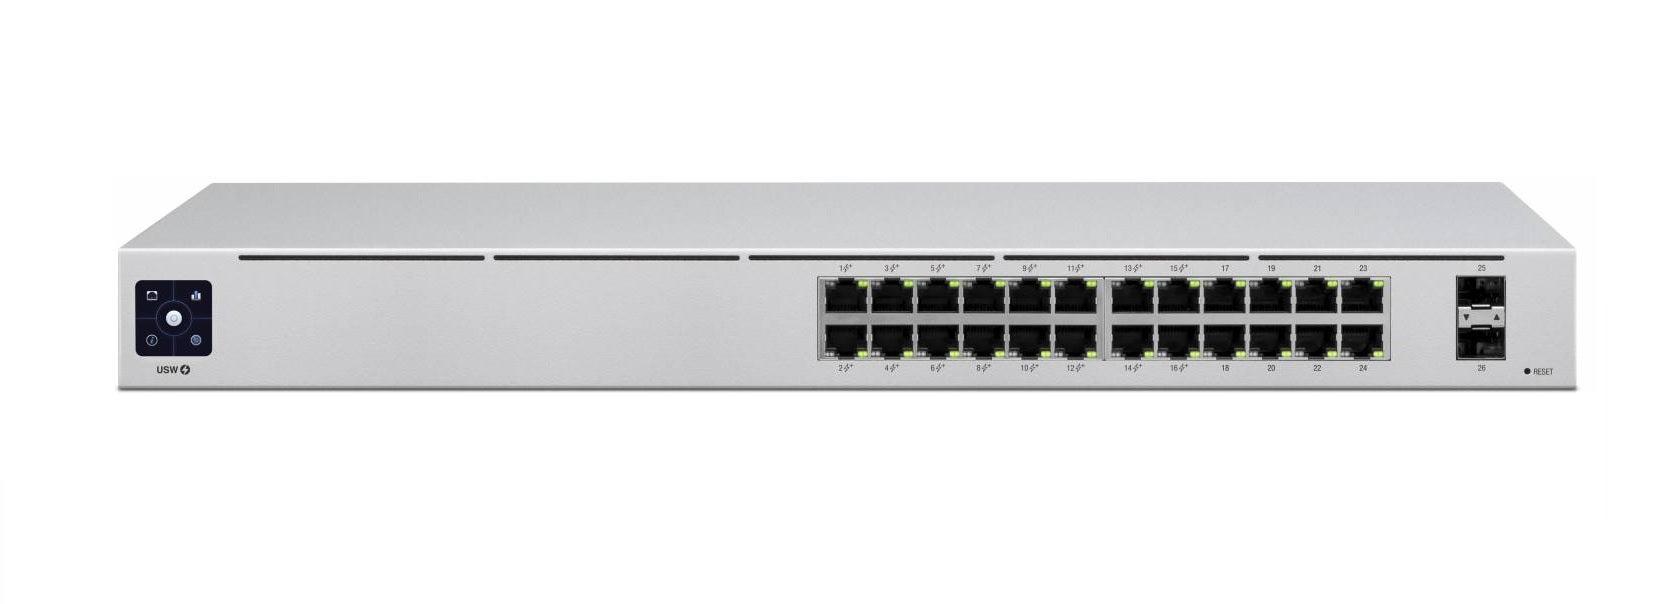 Ubiquiti USW-24-POE Gen2 Networking Switch